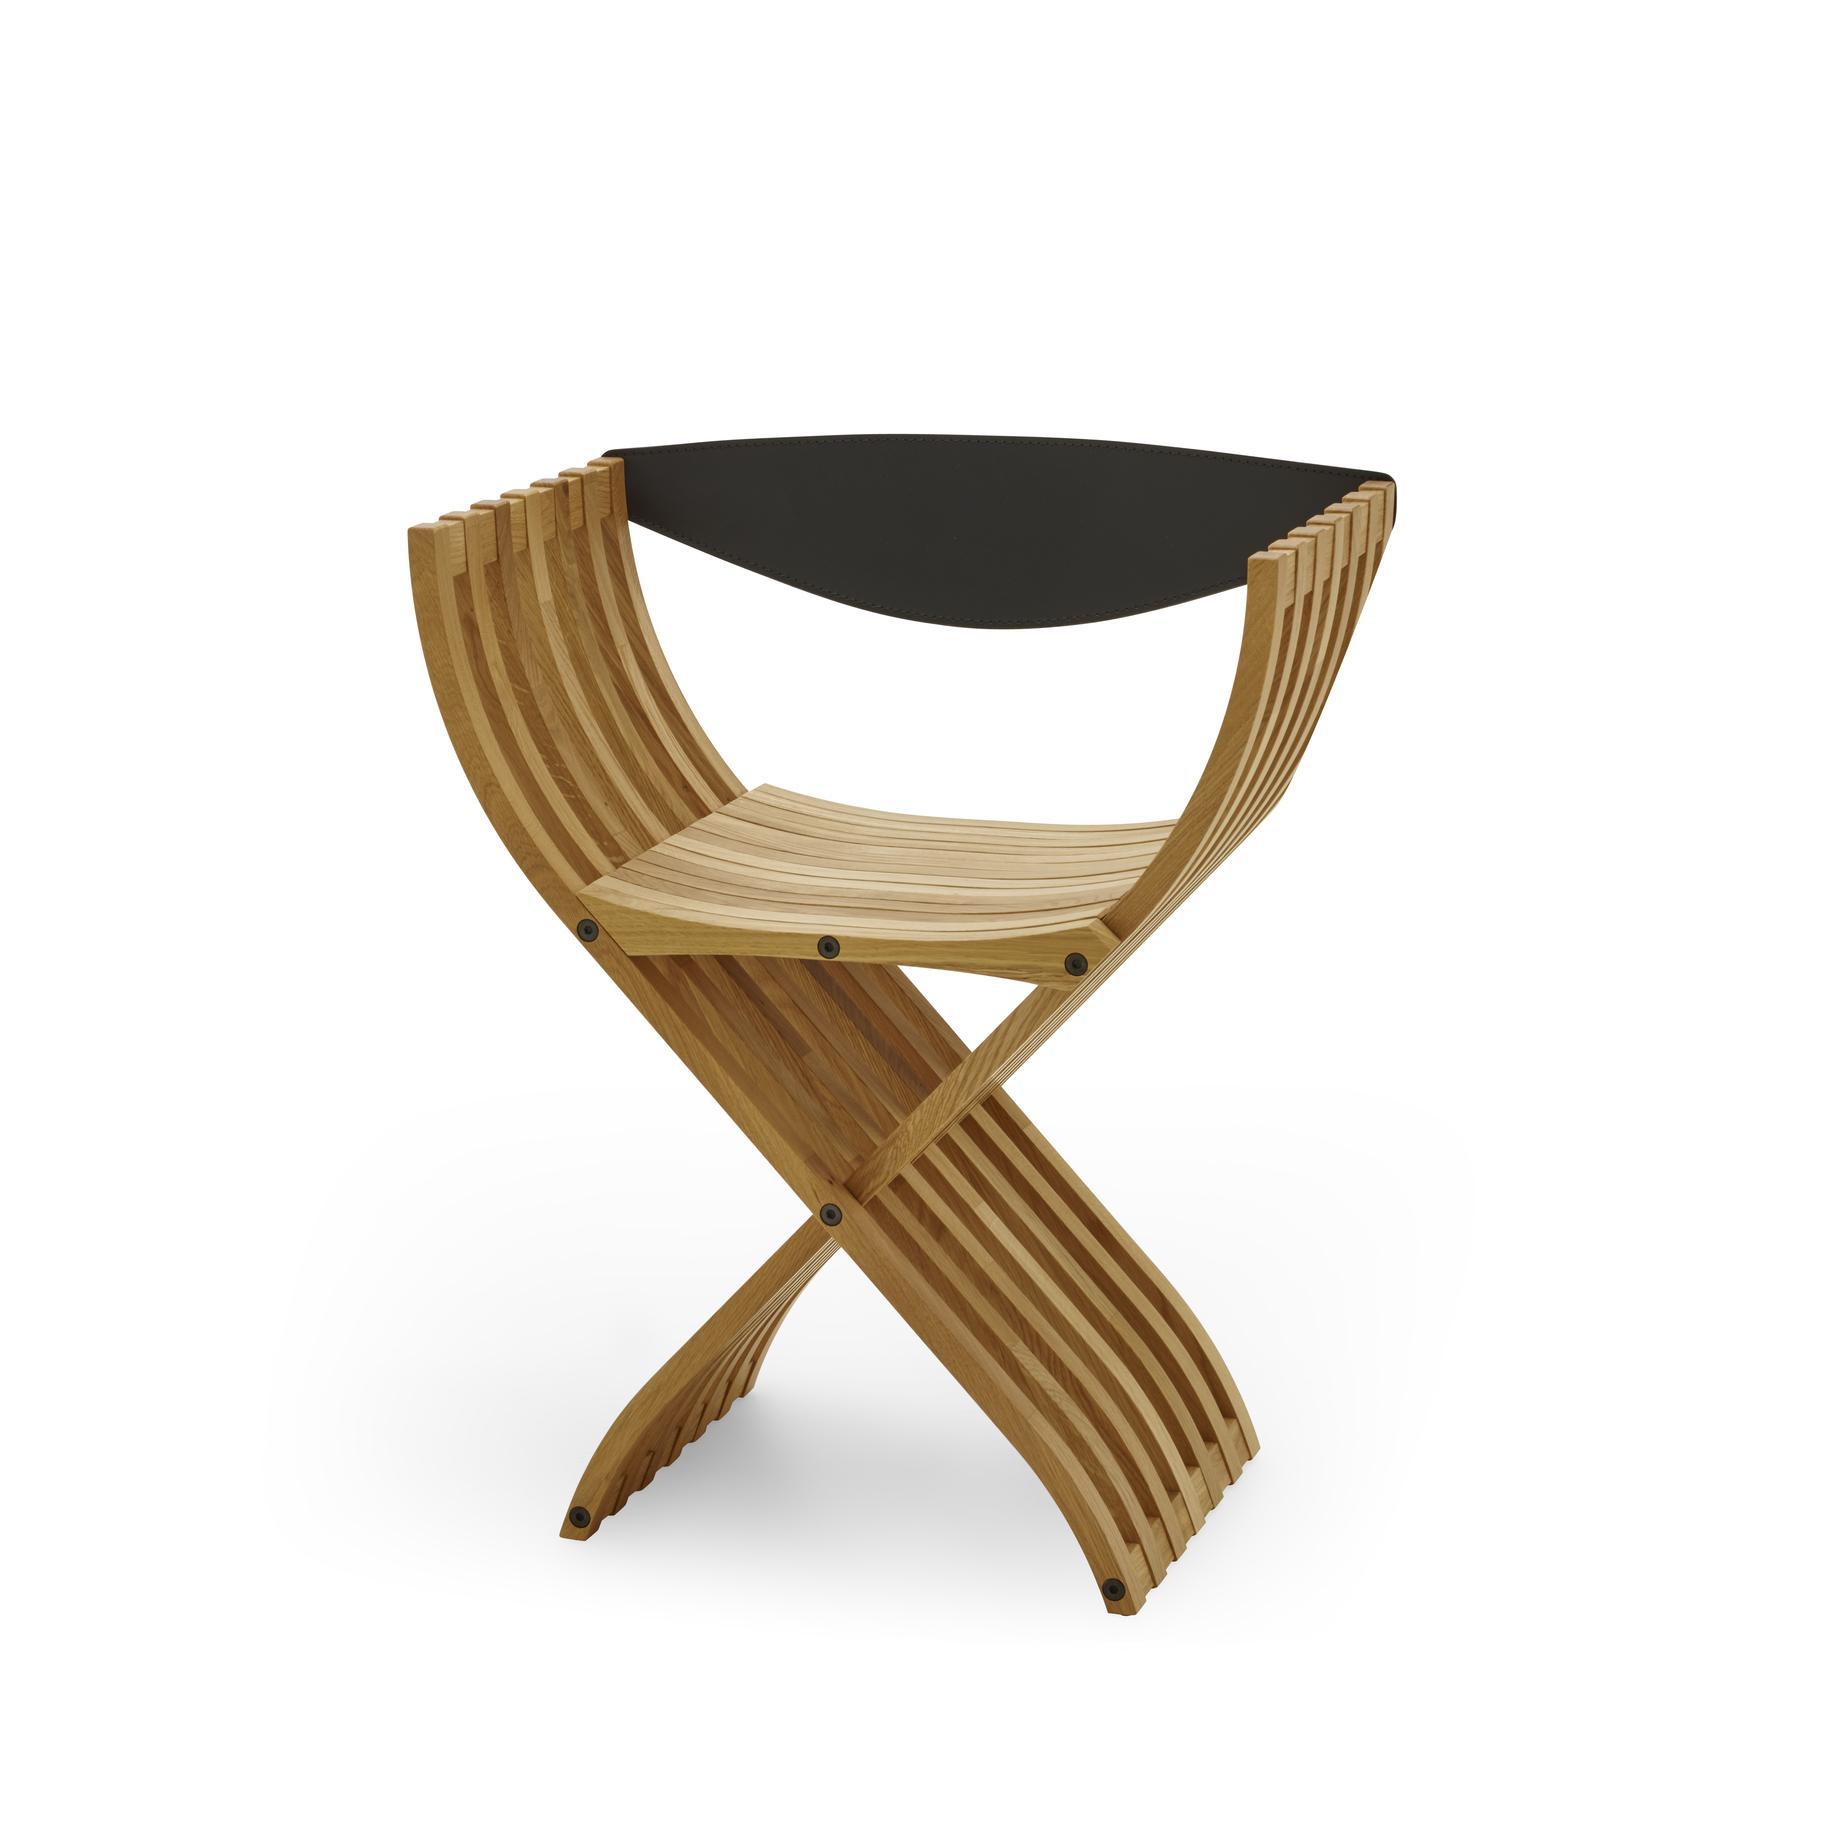 Cinna CURULE, Chairs from Designer : Pierre Paulin